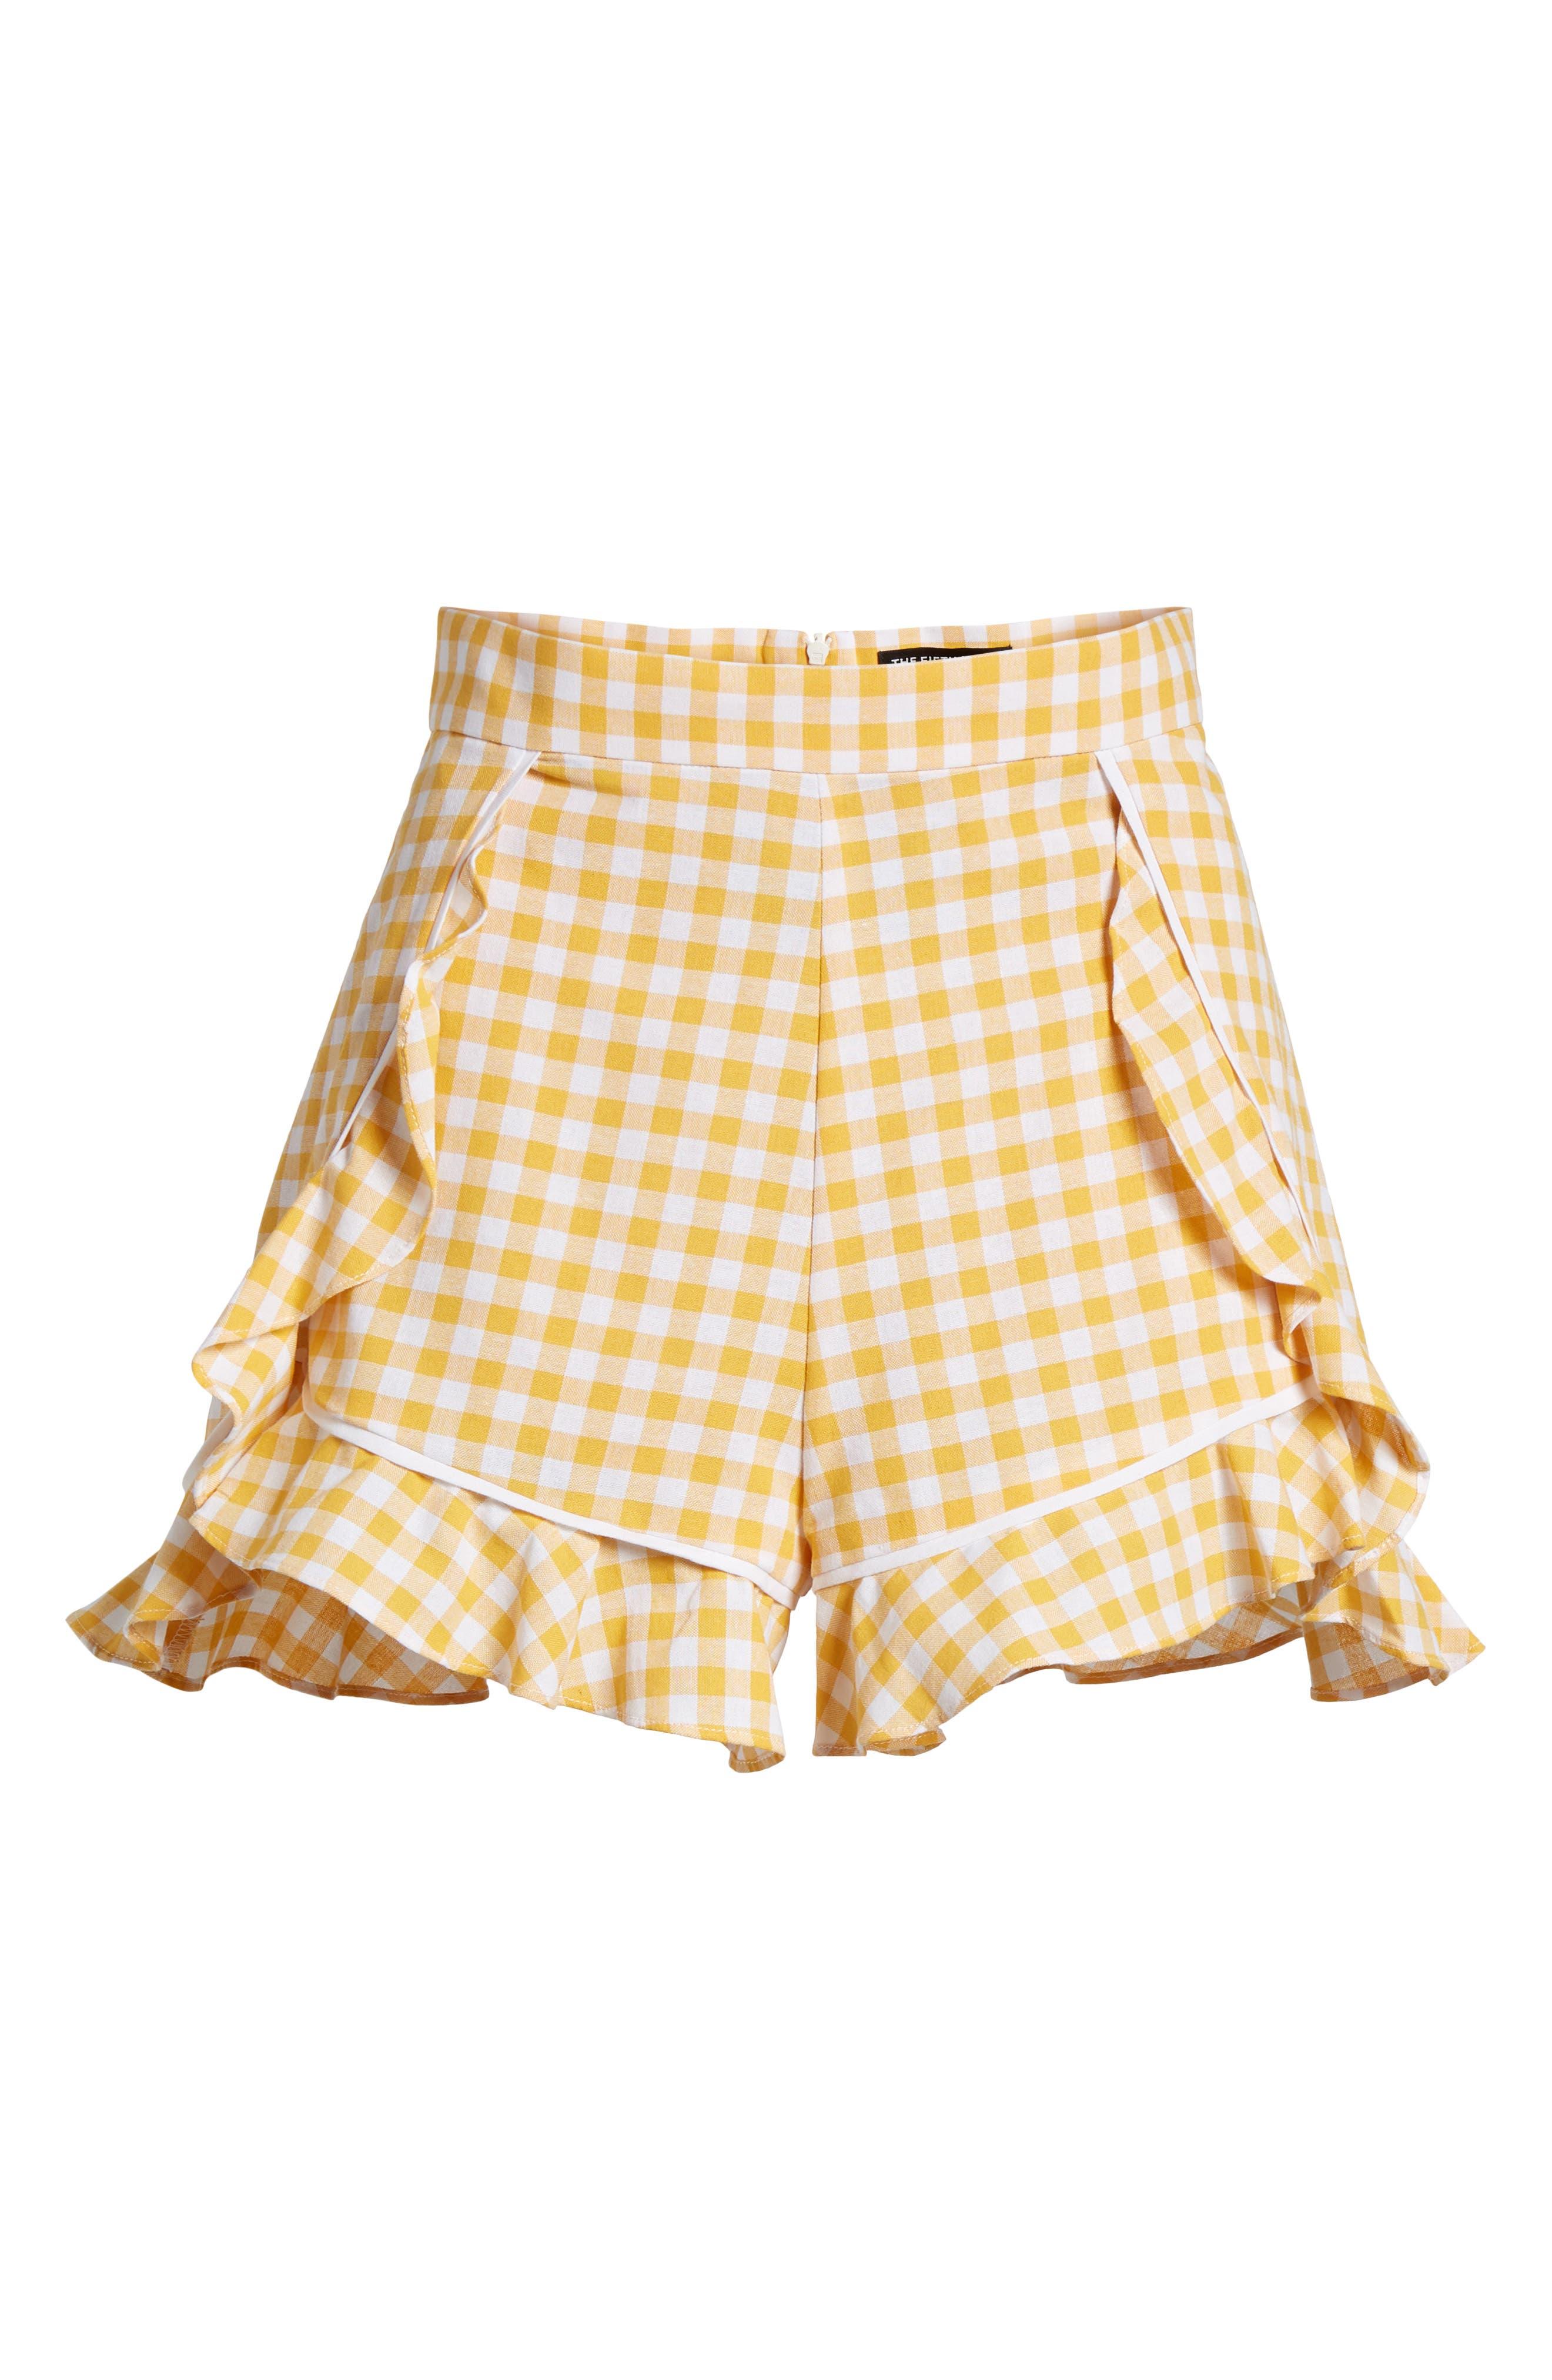 Idyllic Gingham Ruffle Shorts,                             Alternate thumbnail 6, color,                             702